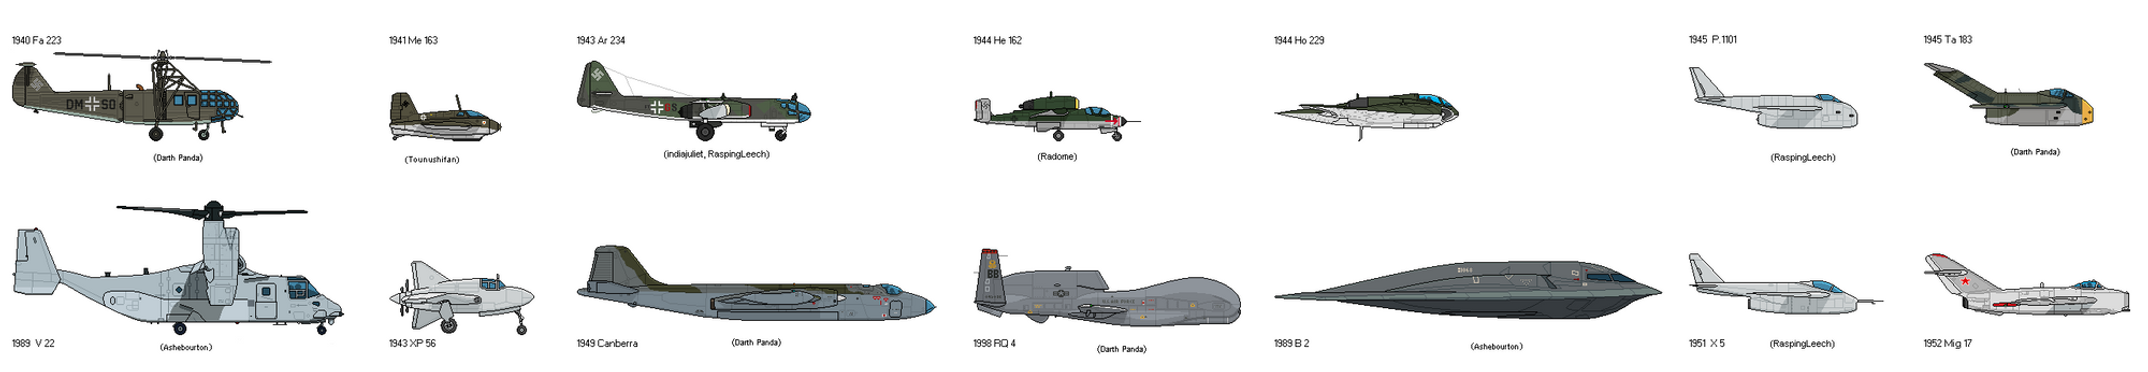 Aircraft Wunderwaffen Timeline by unusable